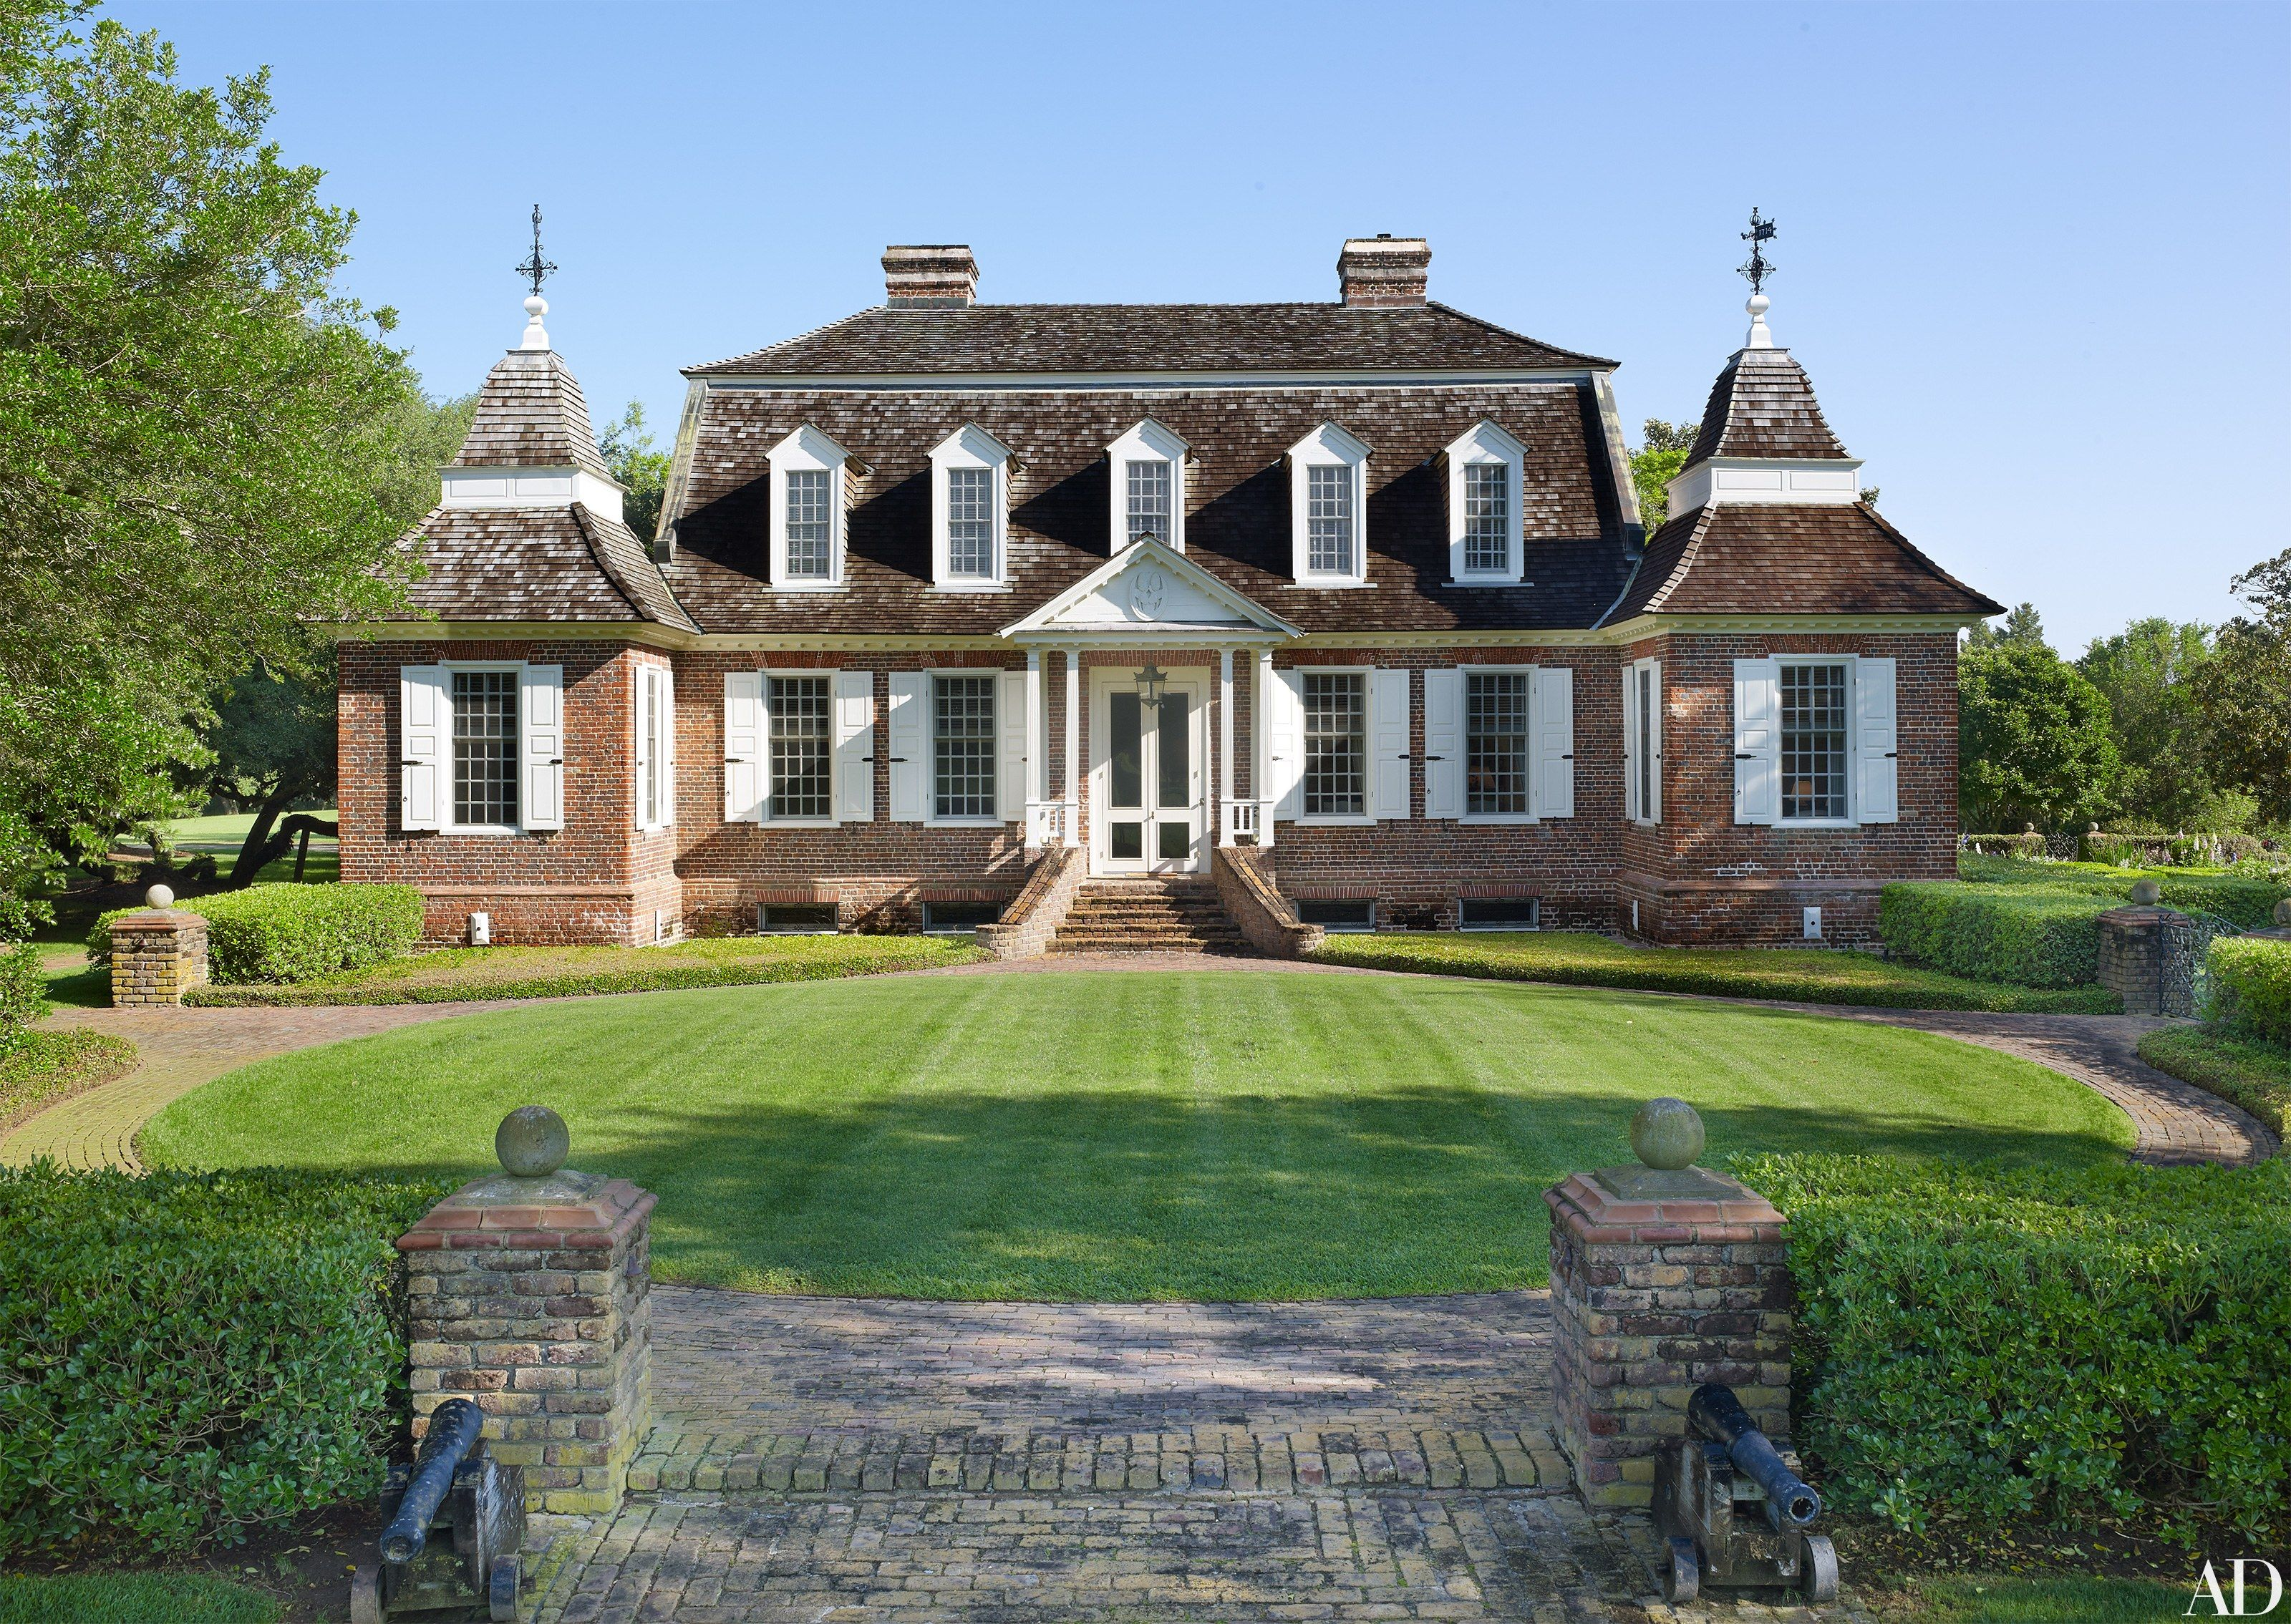 Late victorian era architecture of homes designs color schemes - 1328 Best Perfect Exterior Color Images On Pinterest Exterior Colors Exterior Design And Exterior Paint Colors